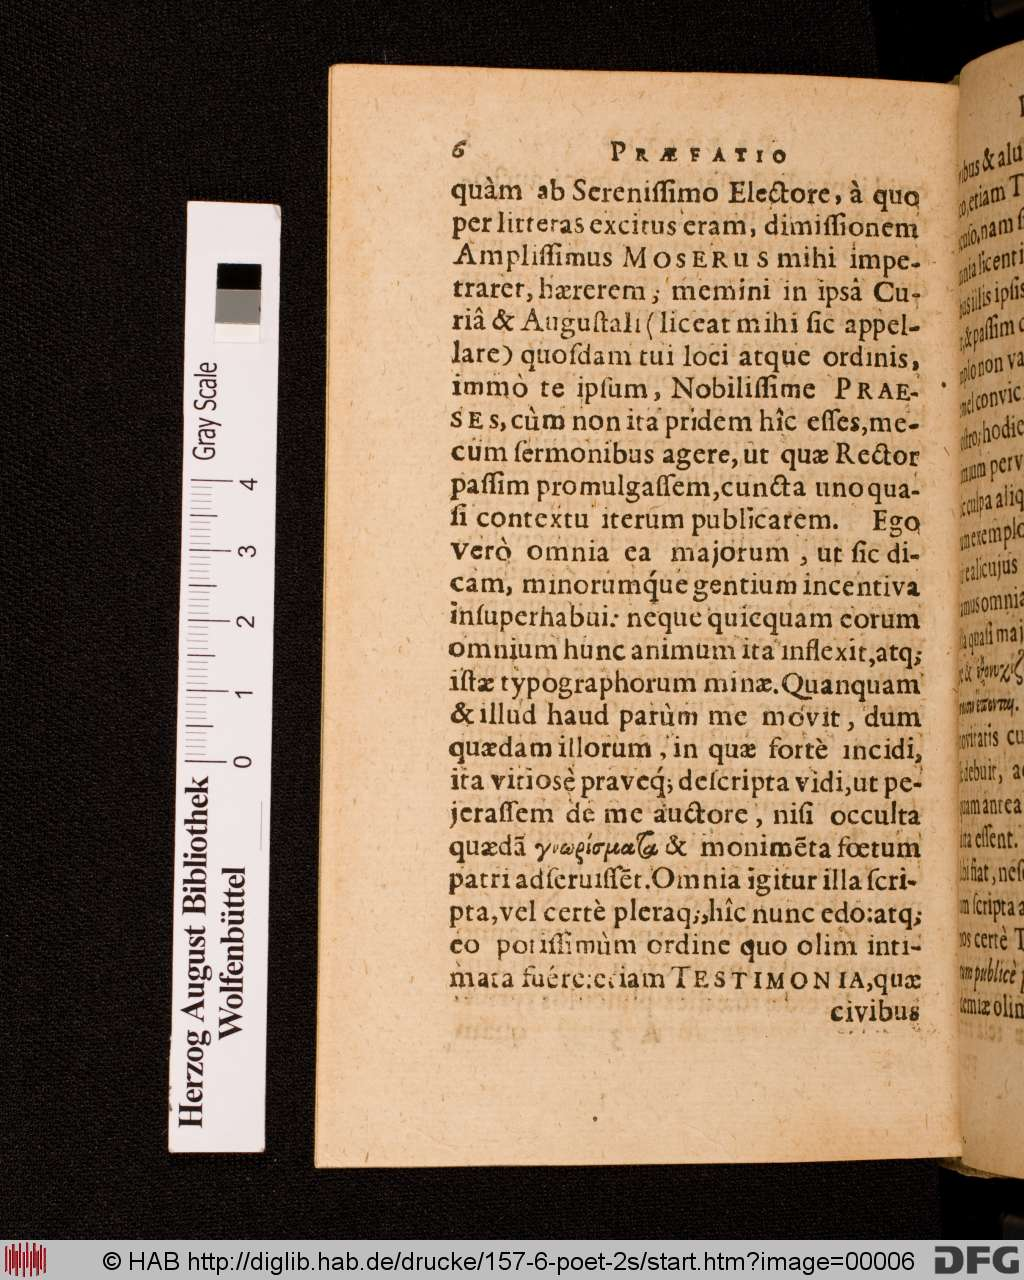 http://diglib.hab.de/drucke/157-6-poet-2s/00006.jpg